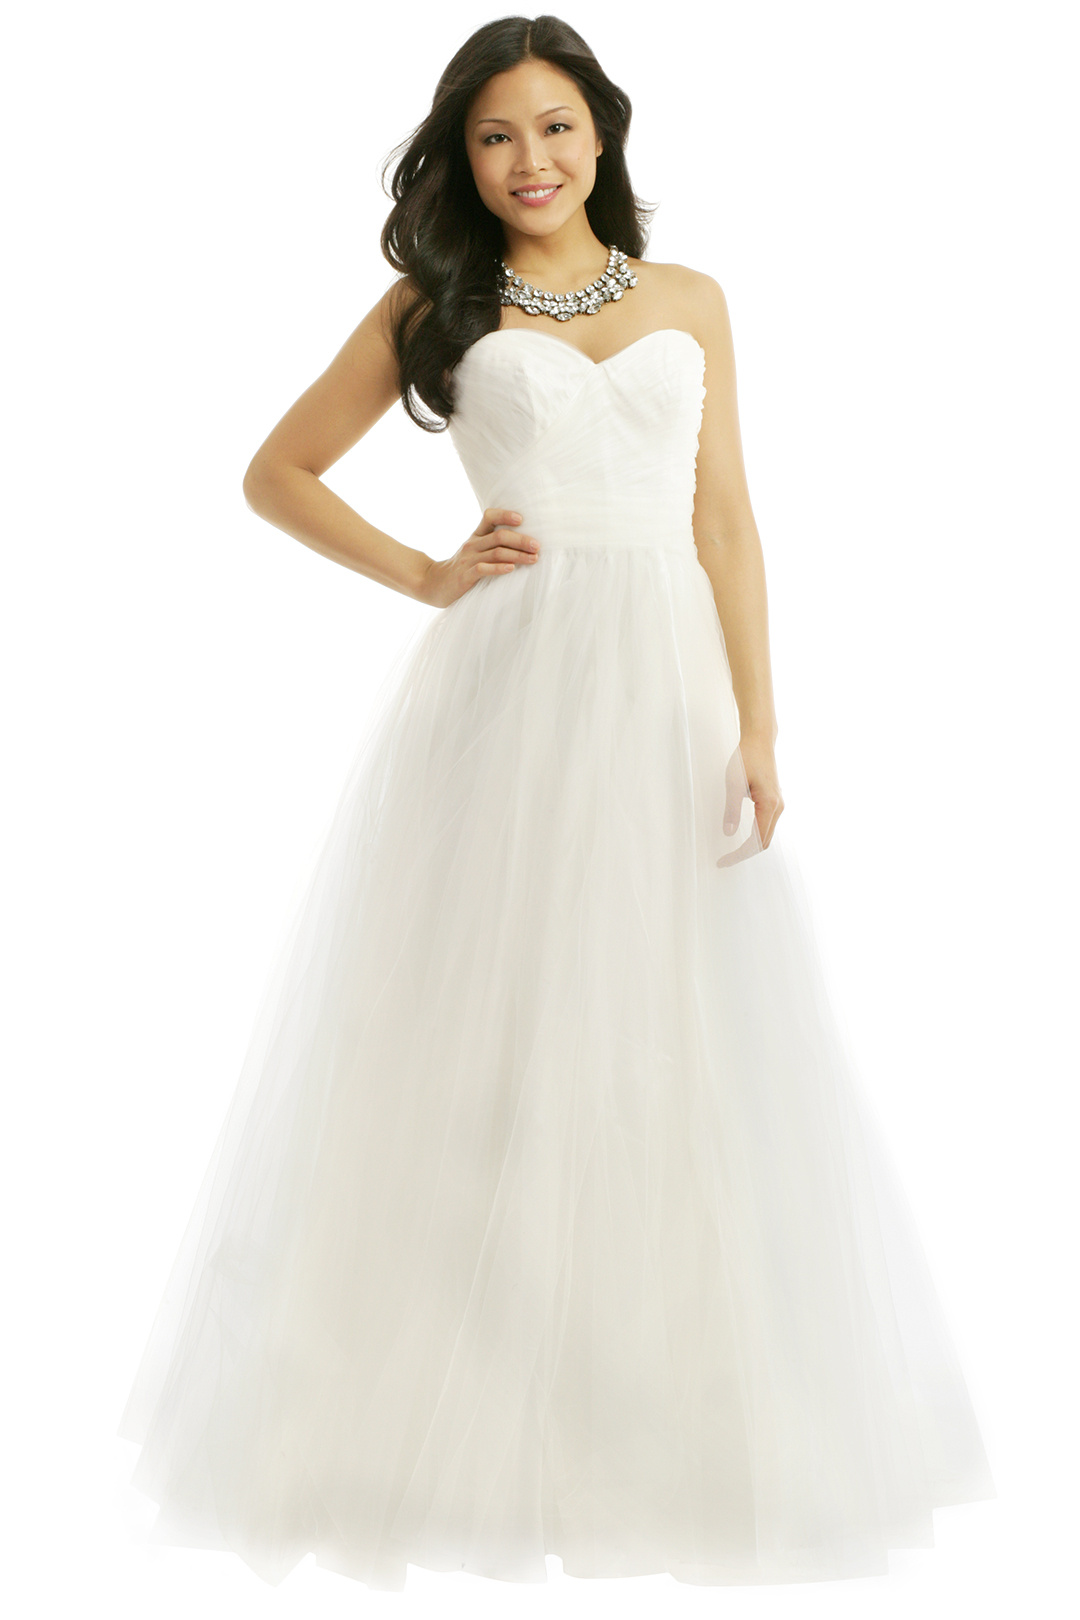 Budget Bride Guide  Bridal Gown  The Black Rebecca